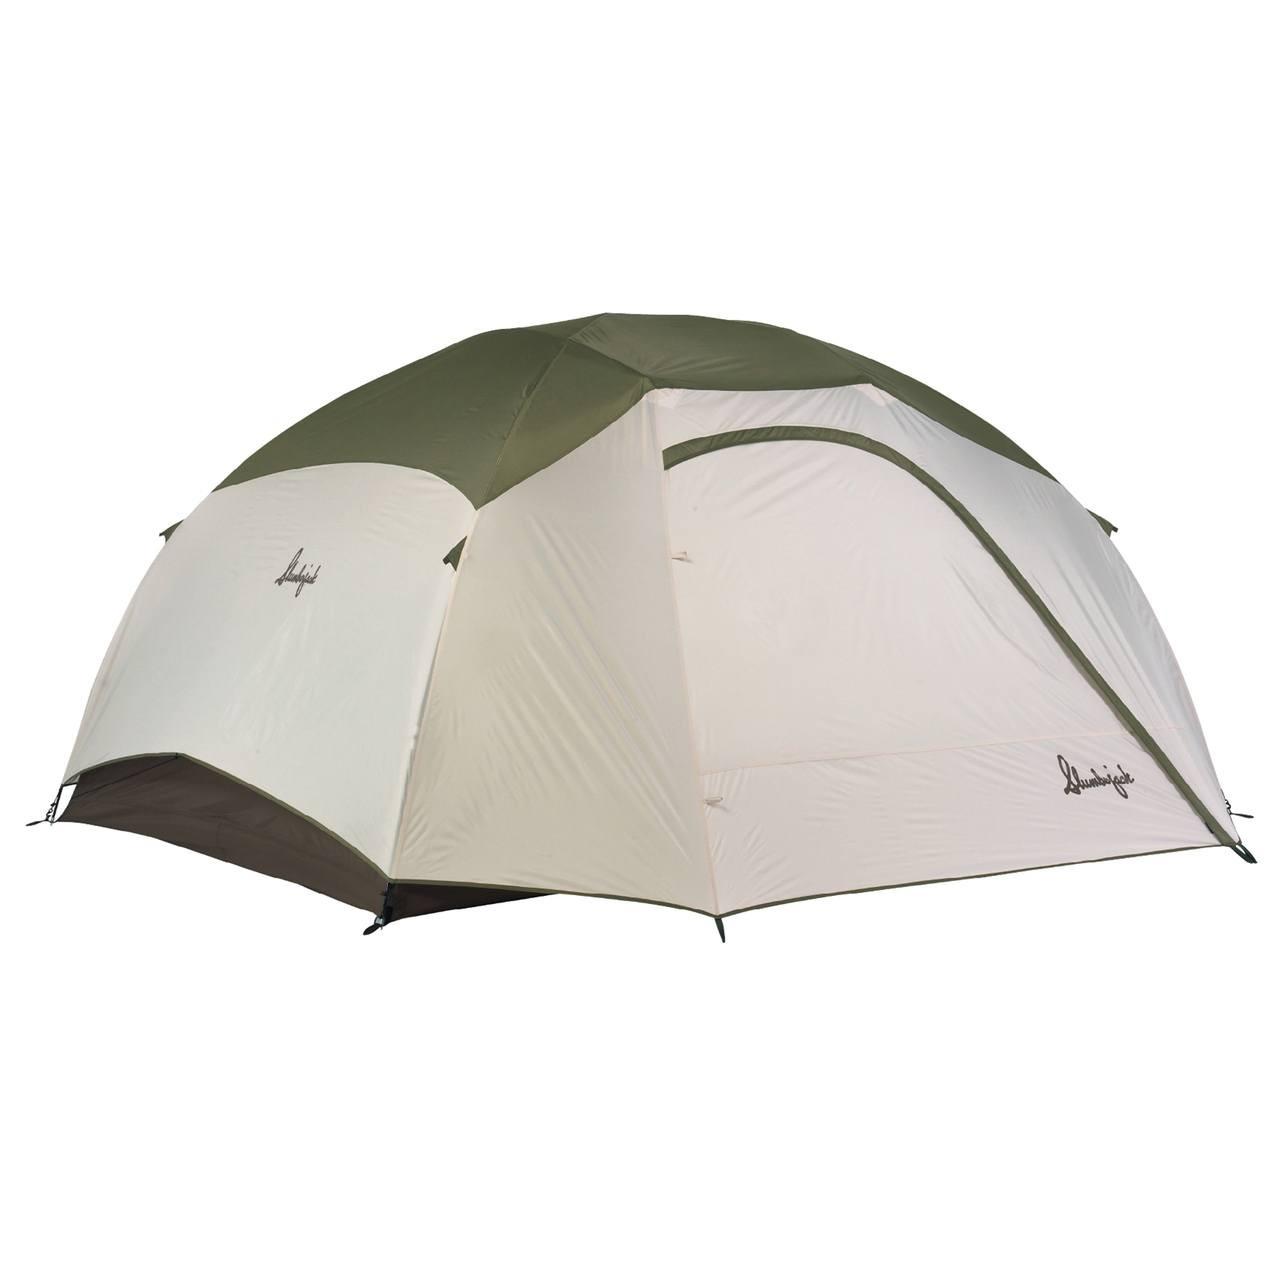 Image 1 · Image 2  sc 1 st  Slumberjack & Slumberjack Trail Tent 6 | Car Camping 6-Person Tent | Camping